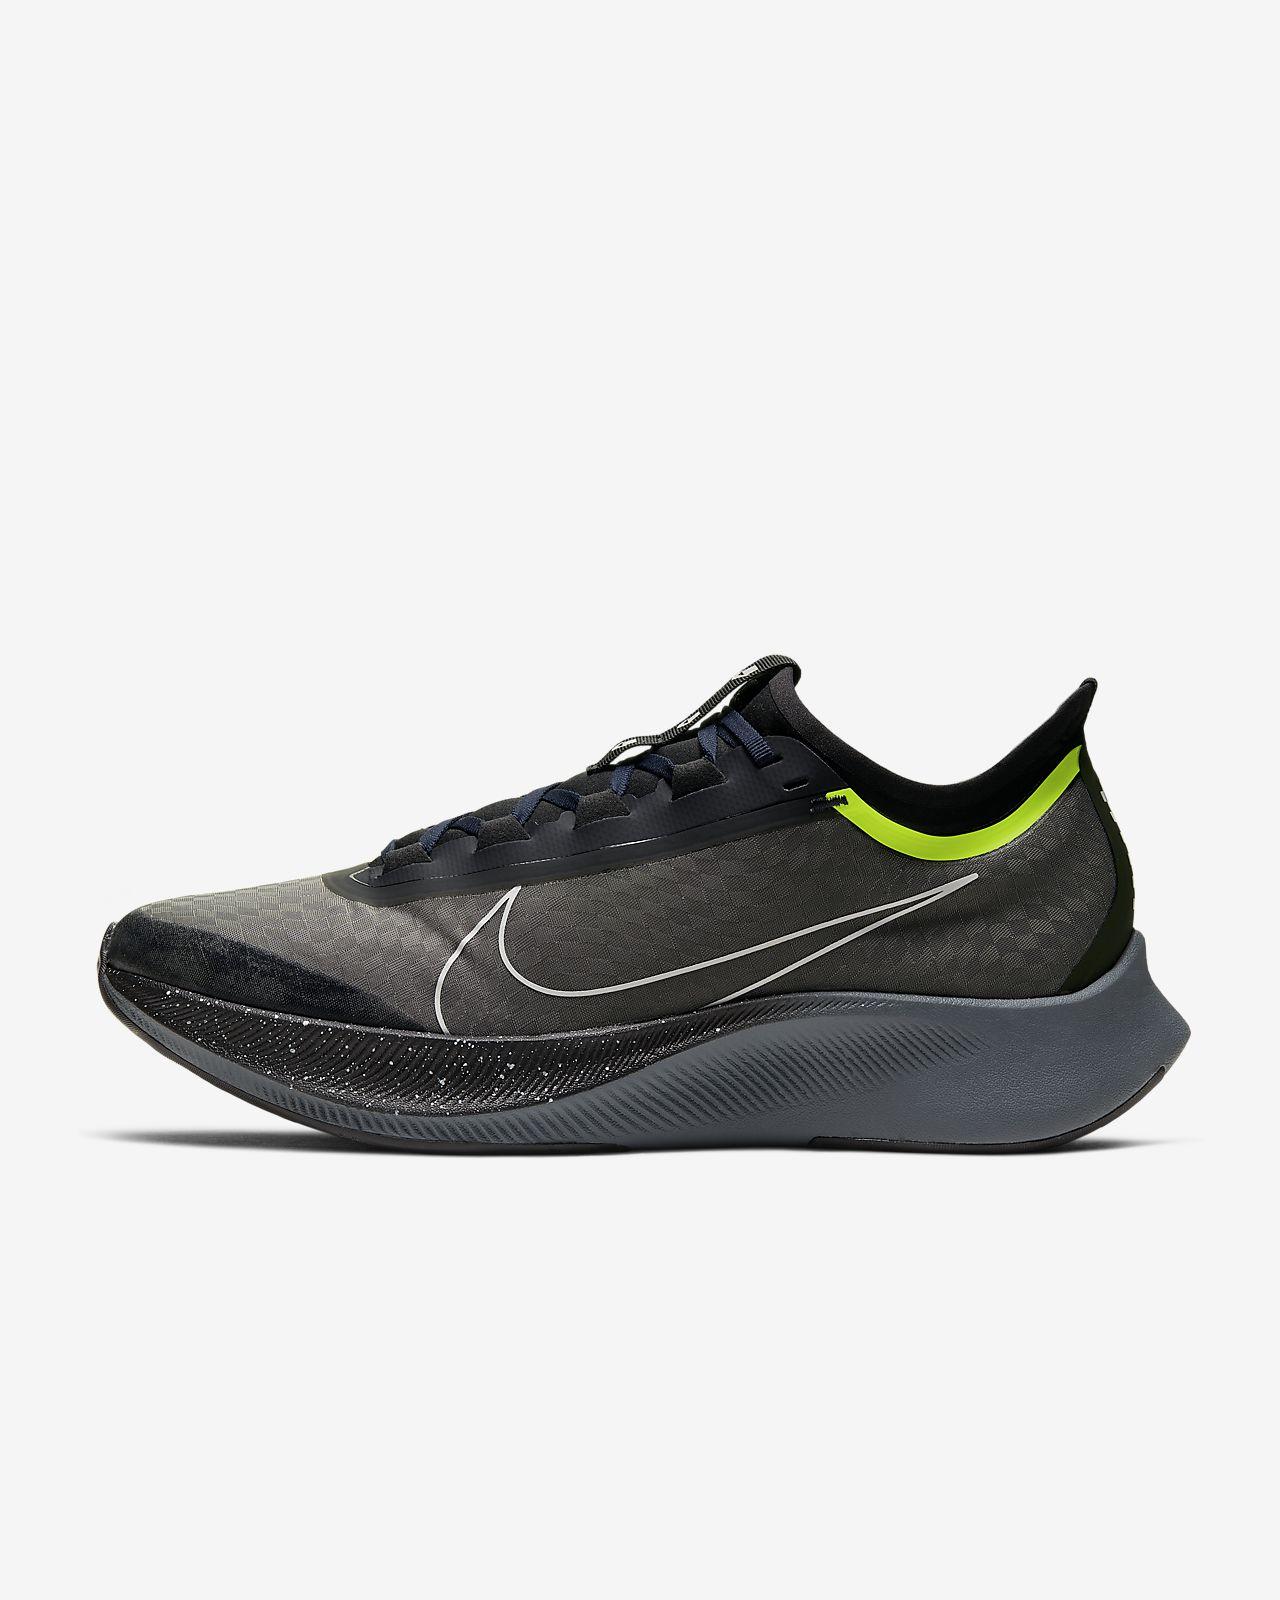 Nike Fly 3 PRM 男子跑步鞋